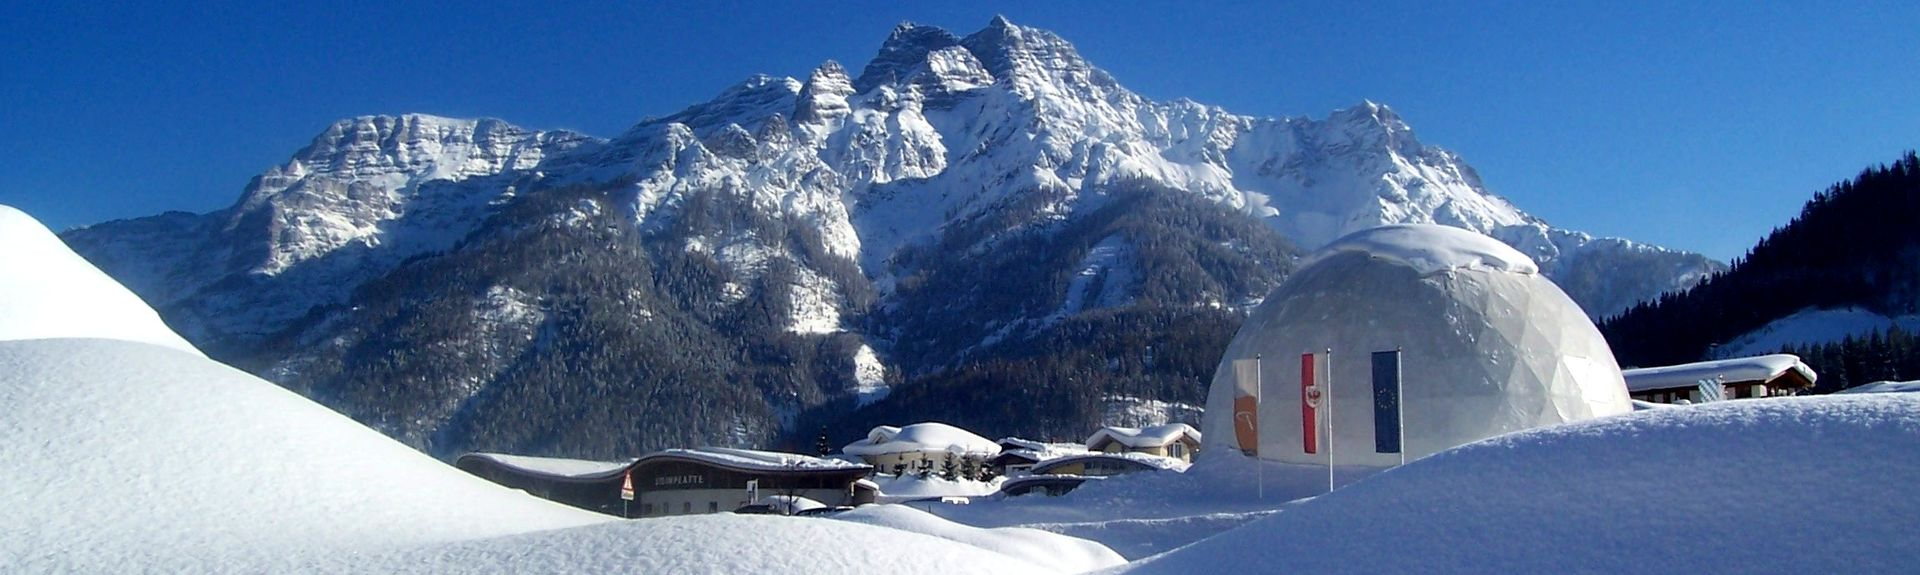 Koessen, Τίρολο, Αυστρία